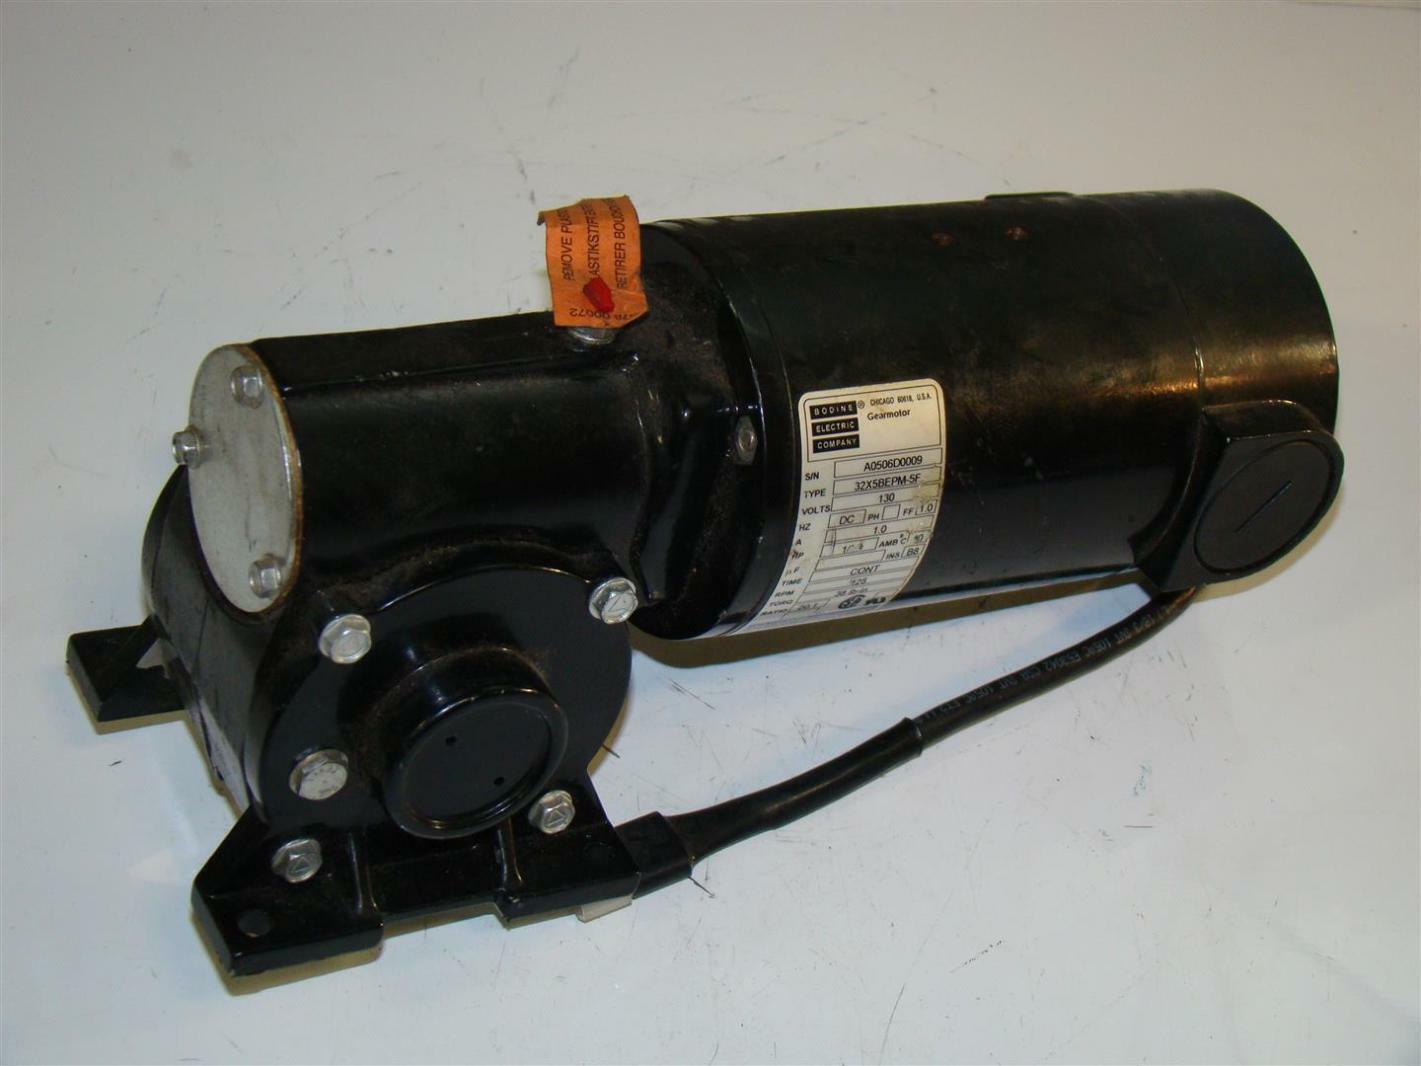 Bodine Electric Company Gearmotor Ratio 20 1 130v 1 2hp 1a